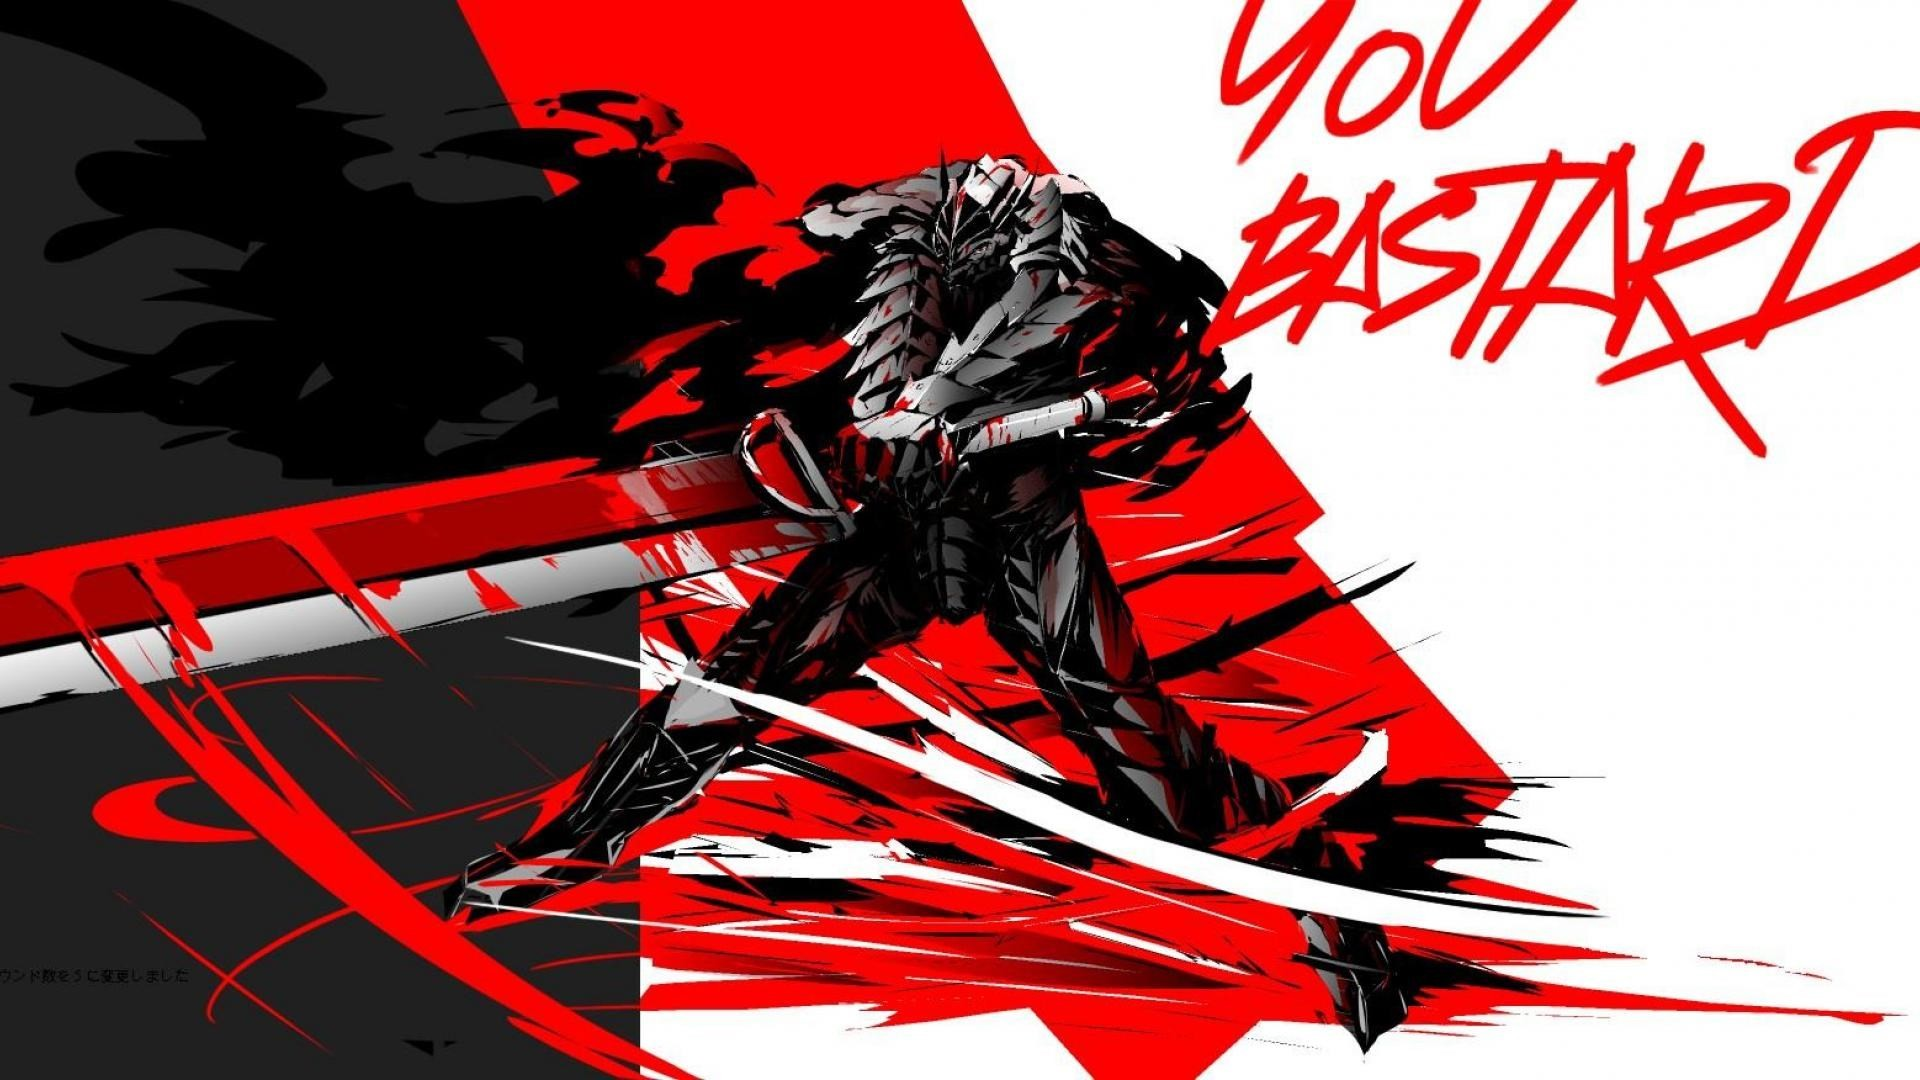 Berserk 1920x1080 Wallpaper HD (57+ images)